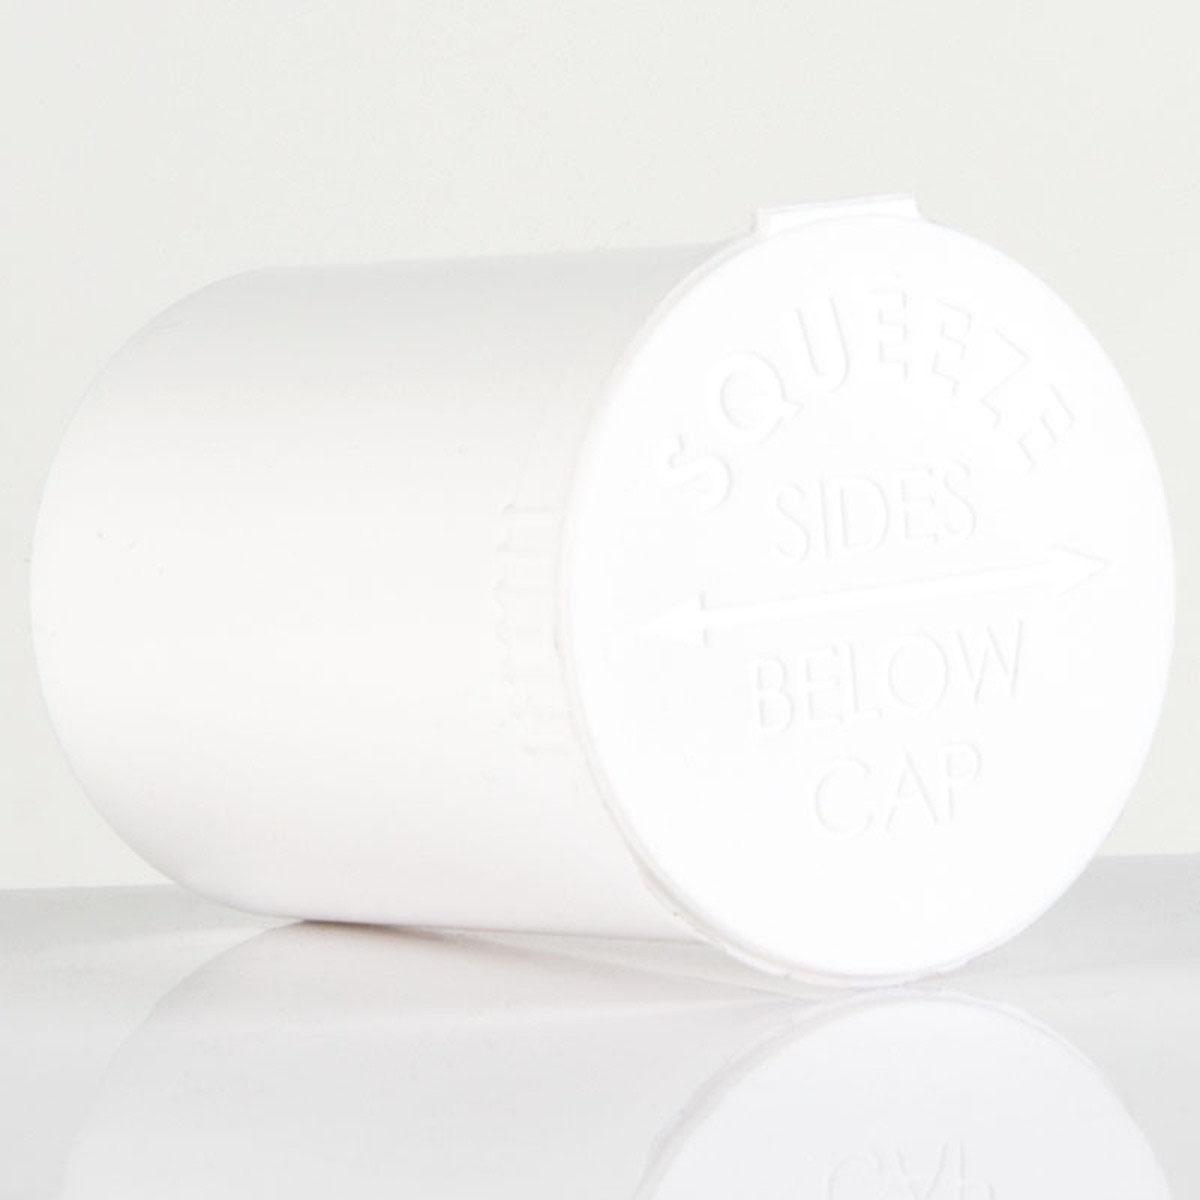 30 Dram Opaque White Child Resistant Pop Top Bottles Big Box (300 Qty.)